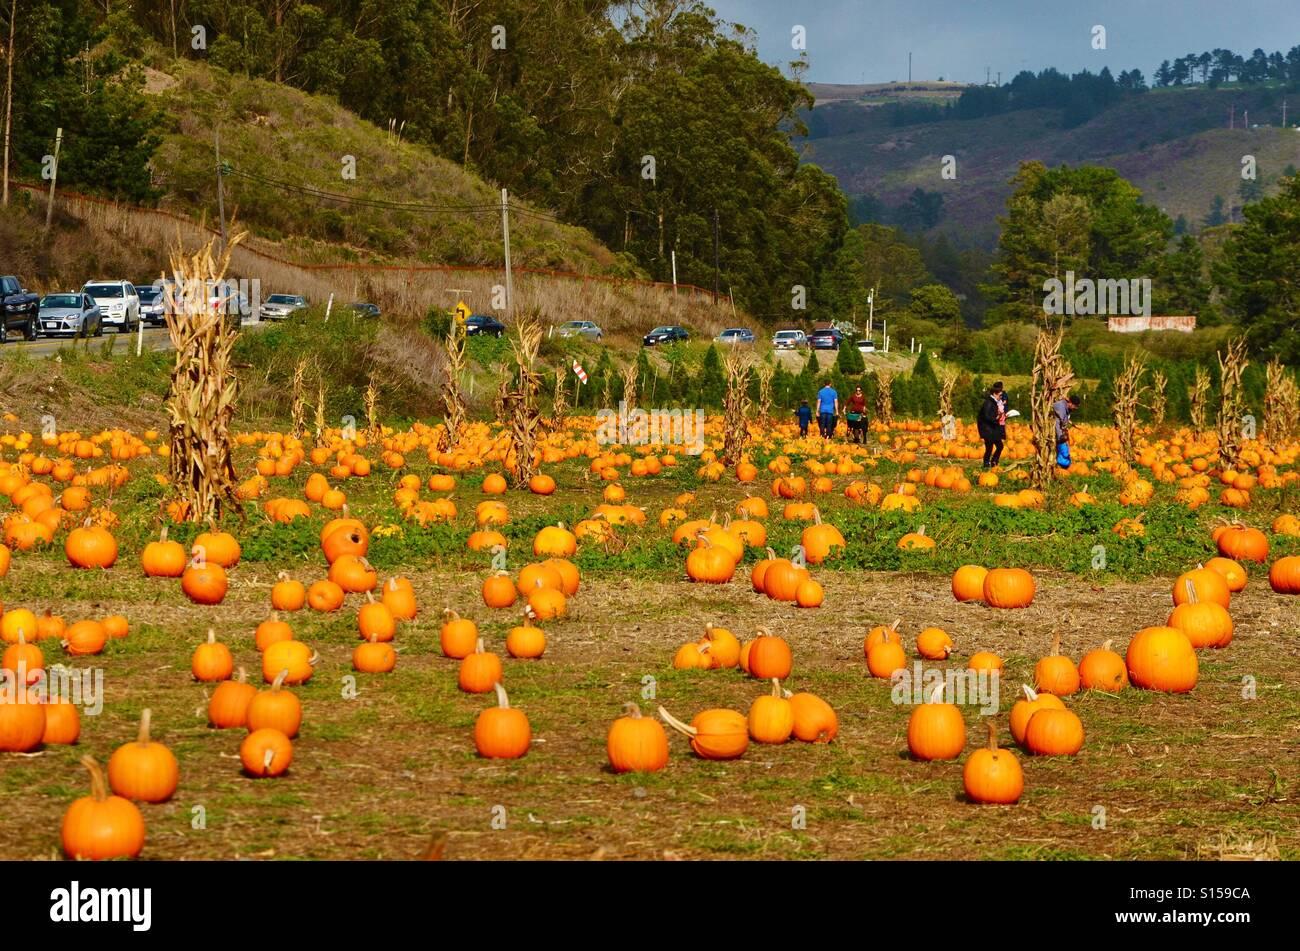 Half Moon Bay Pumpkin Festival 2020.Autumn Pumpkin Patch California Stock Photos Autumn